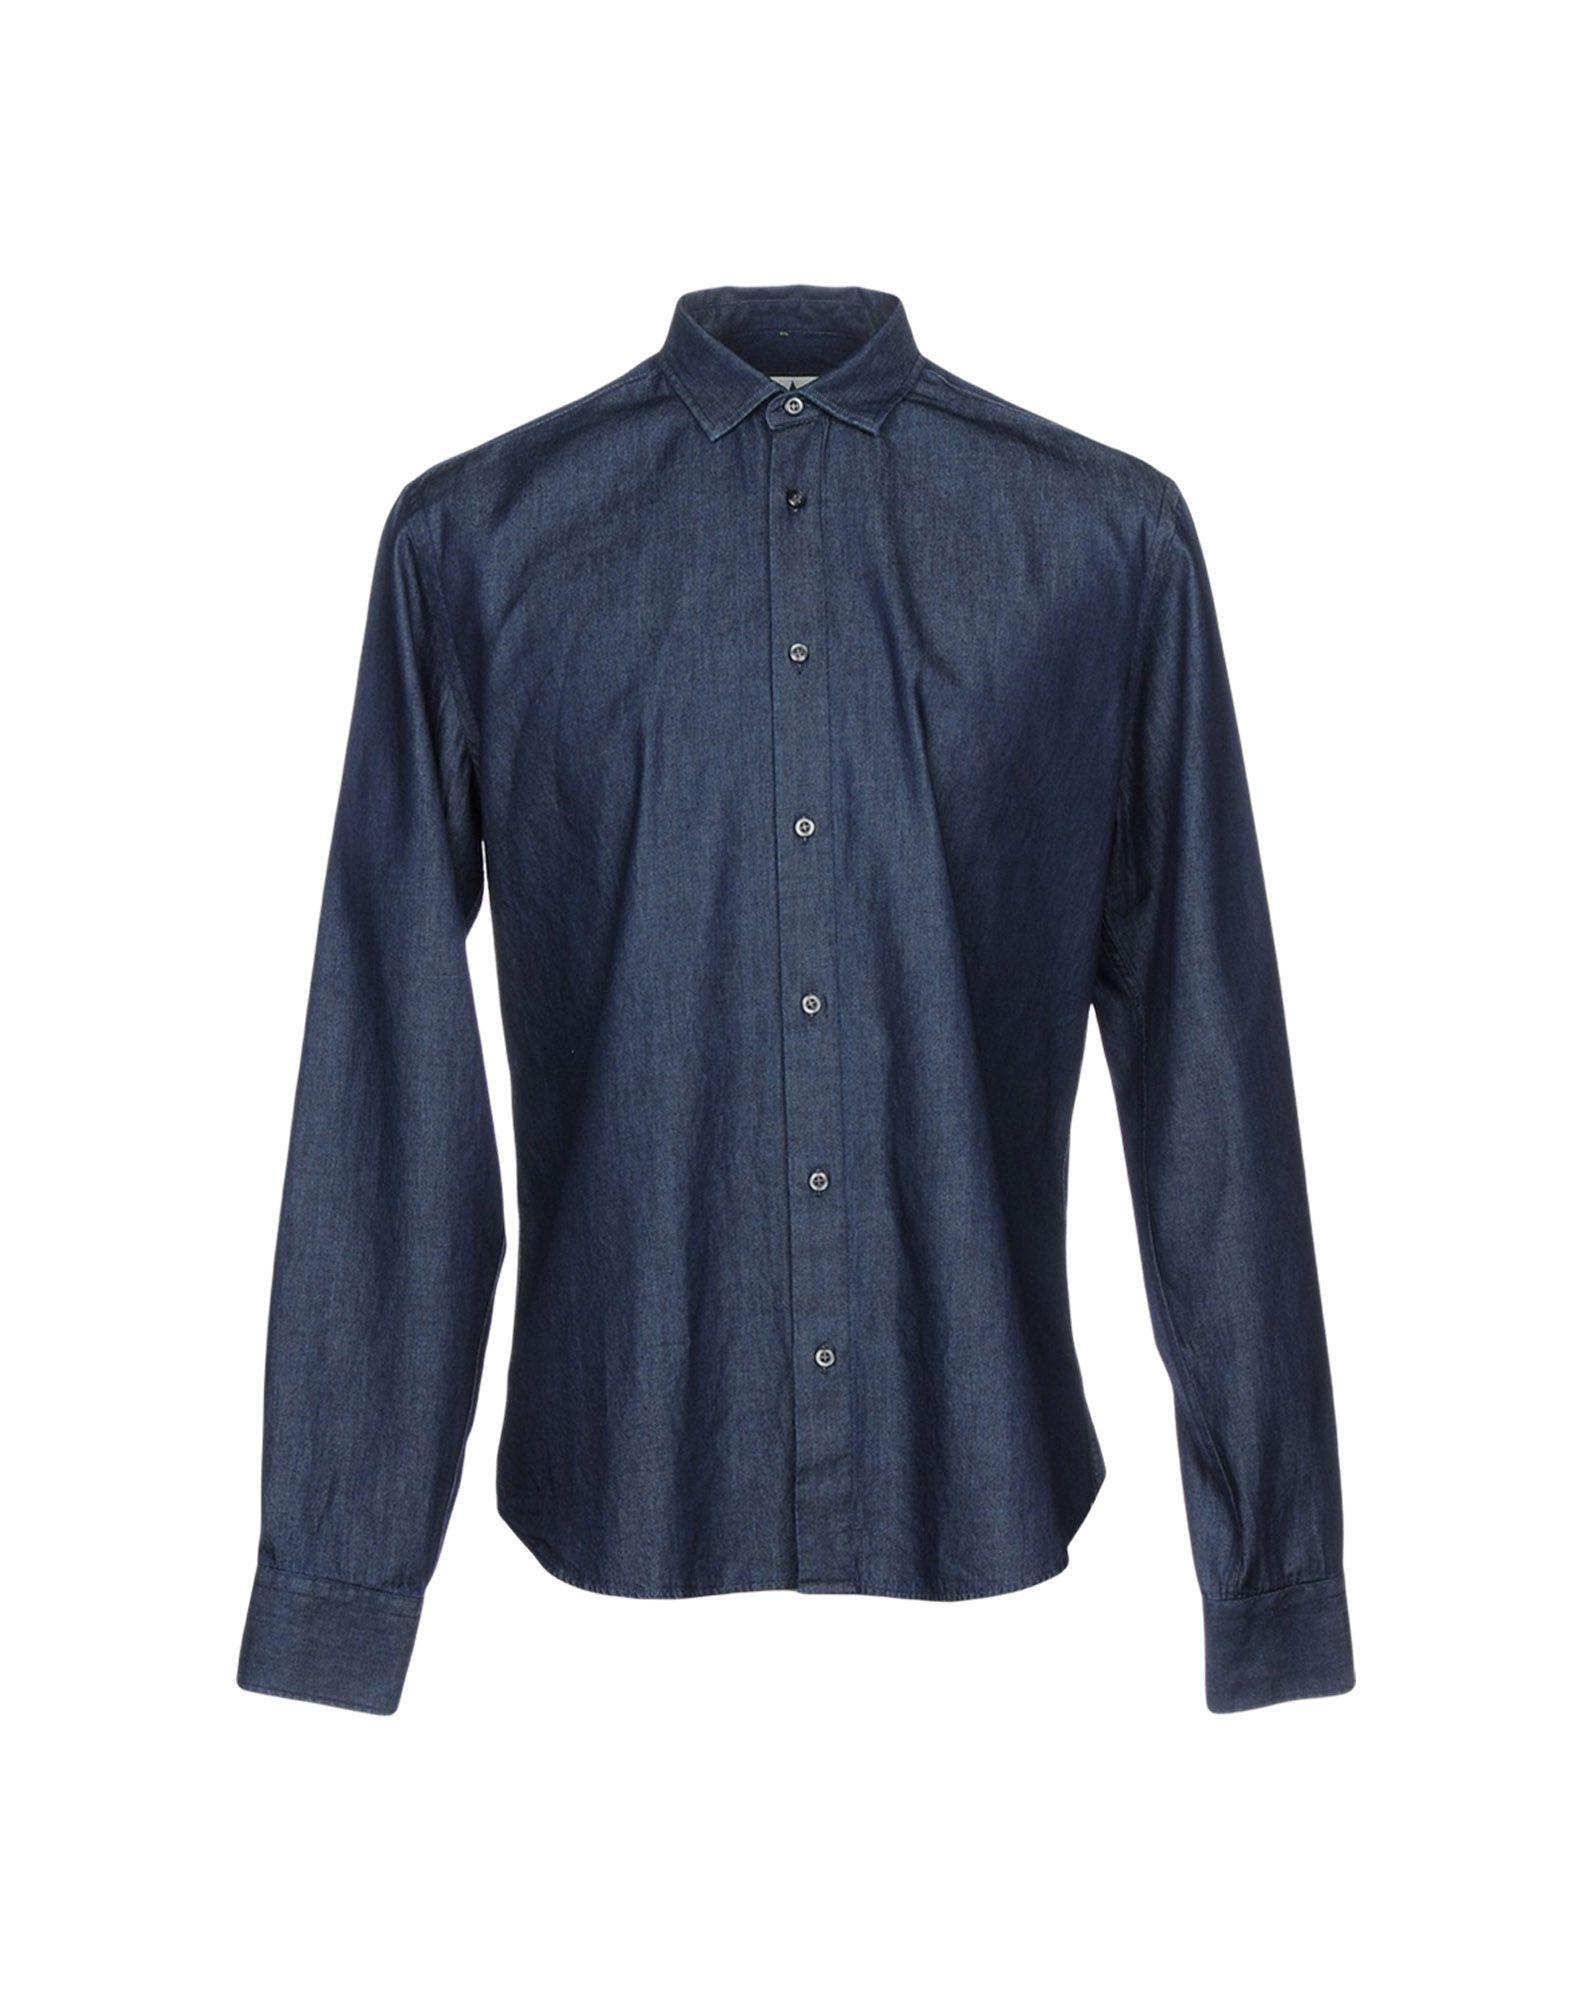 MACCHIA J Джинсовая рубашка black box 74082